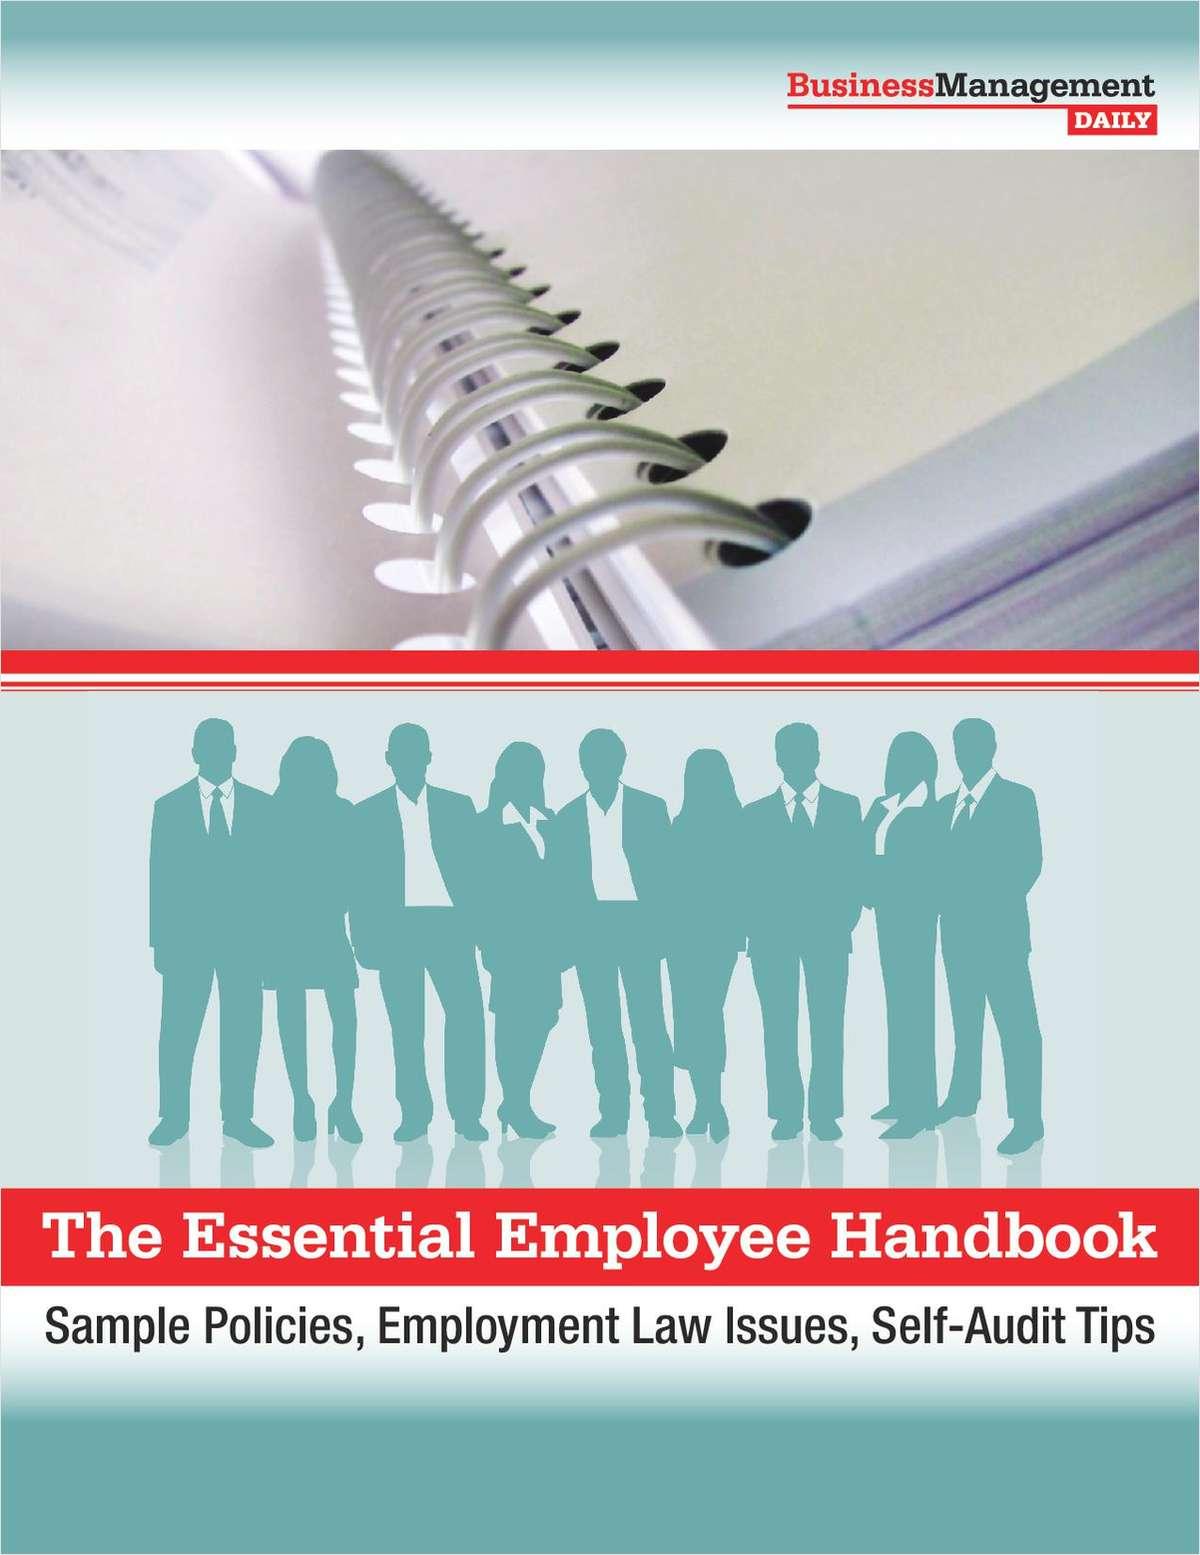 The Essential Employee Handbook